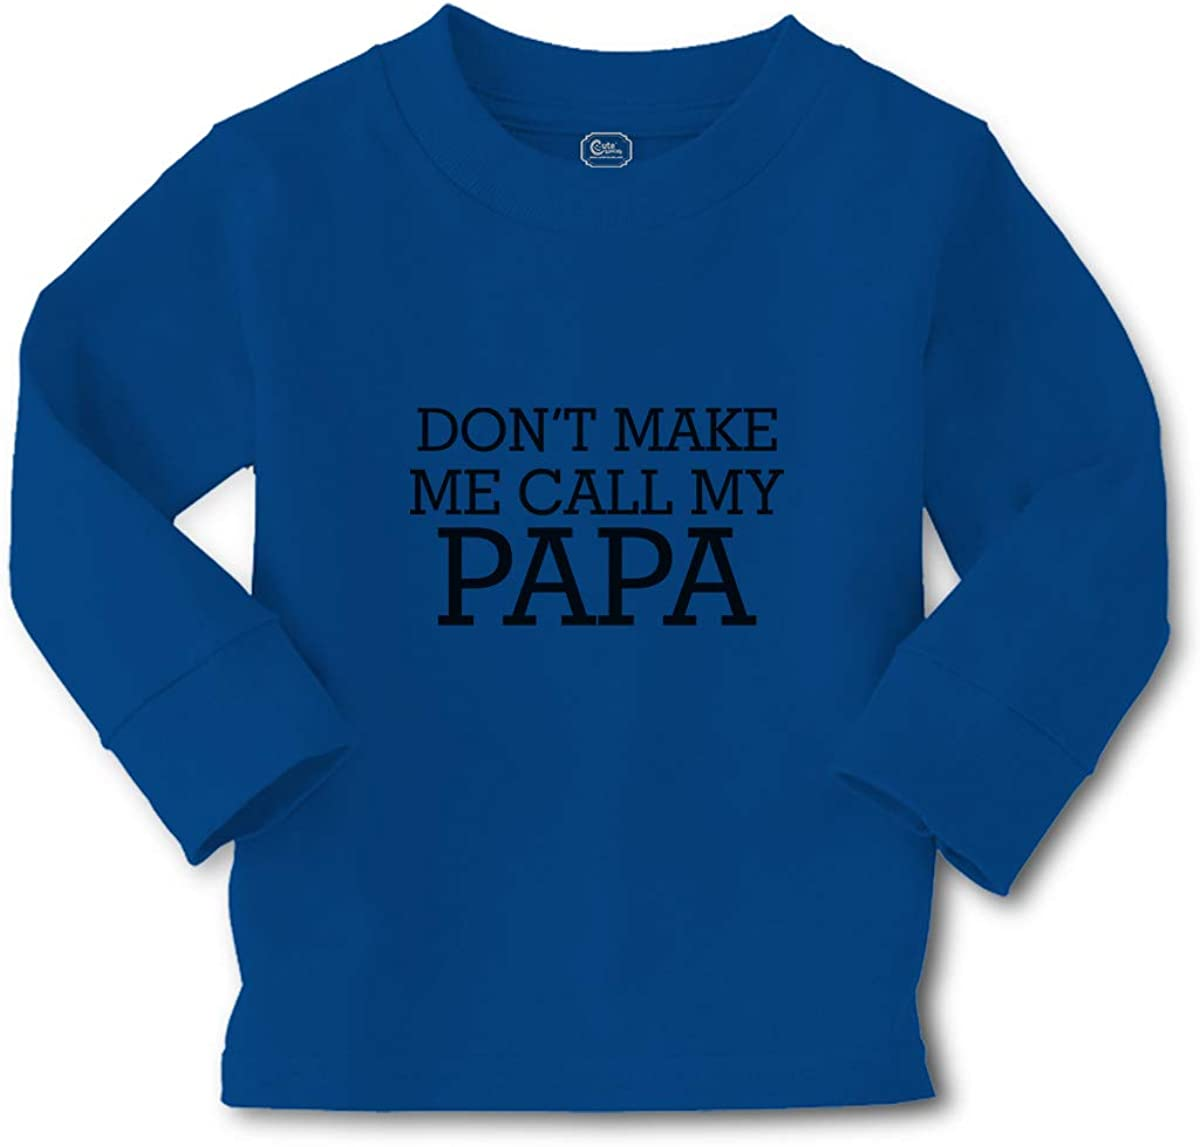 Kids Long Sleeve T Shirt Don't Make Me Call My Papa Cotton Boy & Girl Clothes